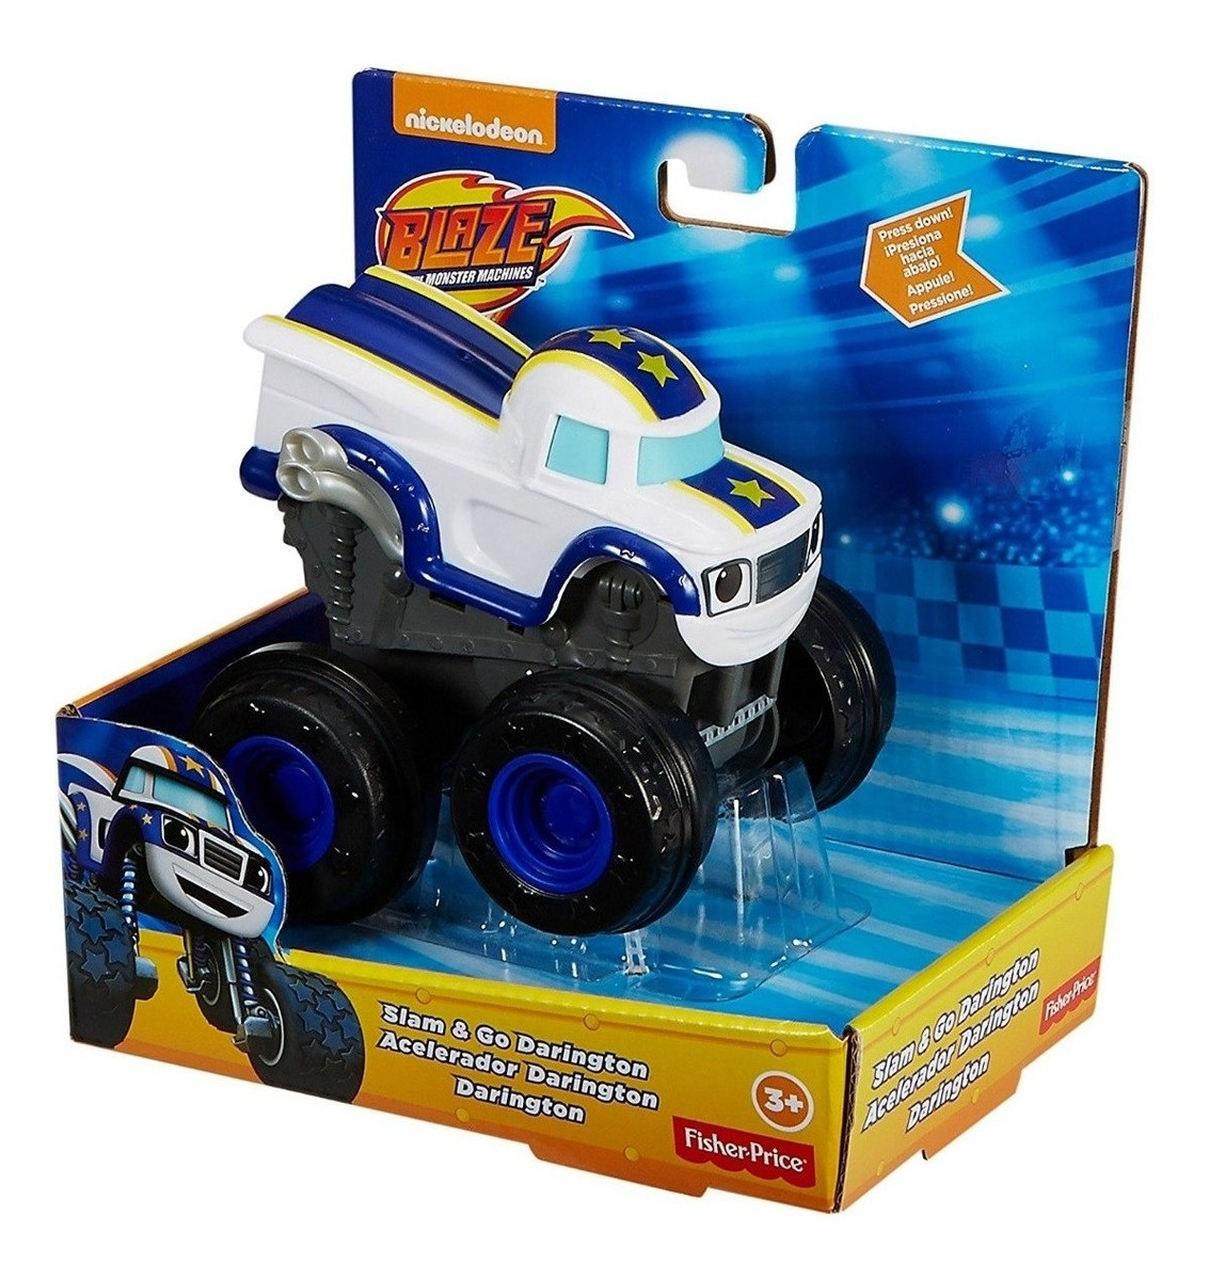 Carro Blaze Monster Machine - Slam Go Darington Fisher Price